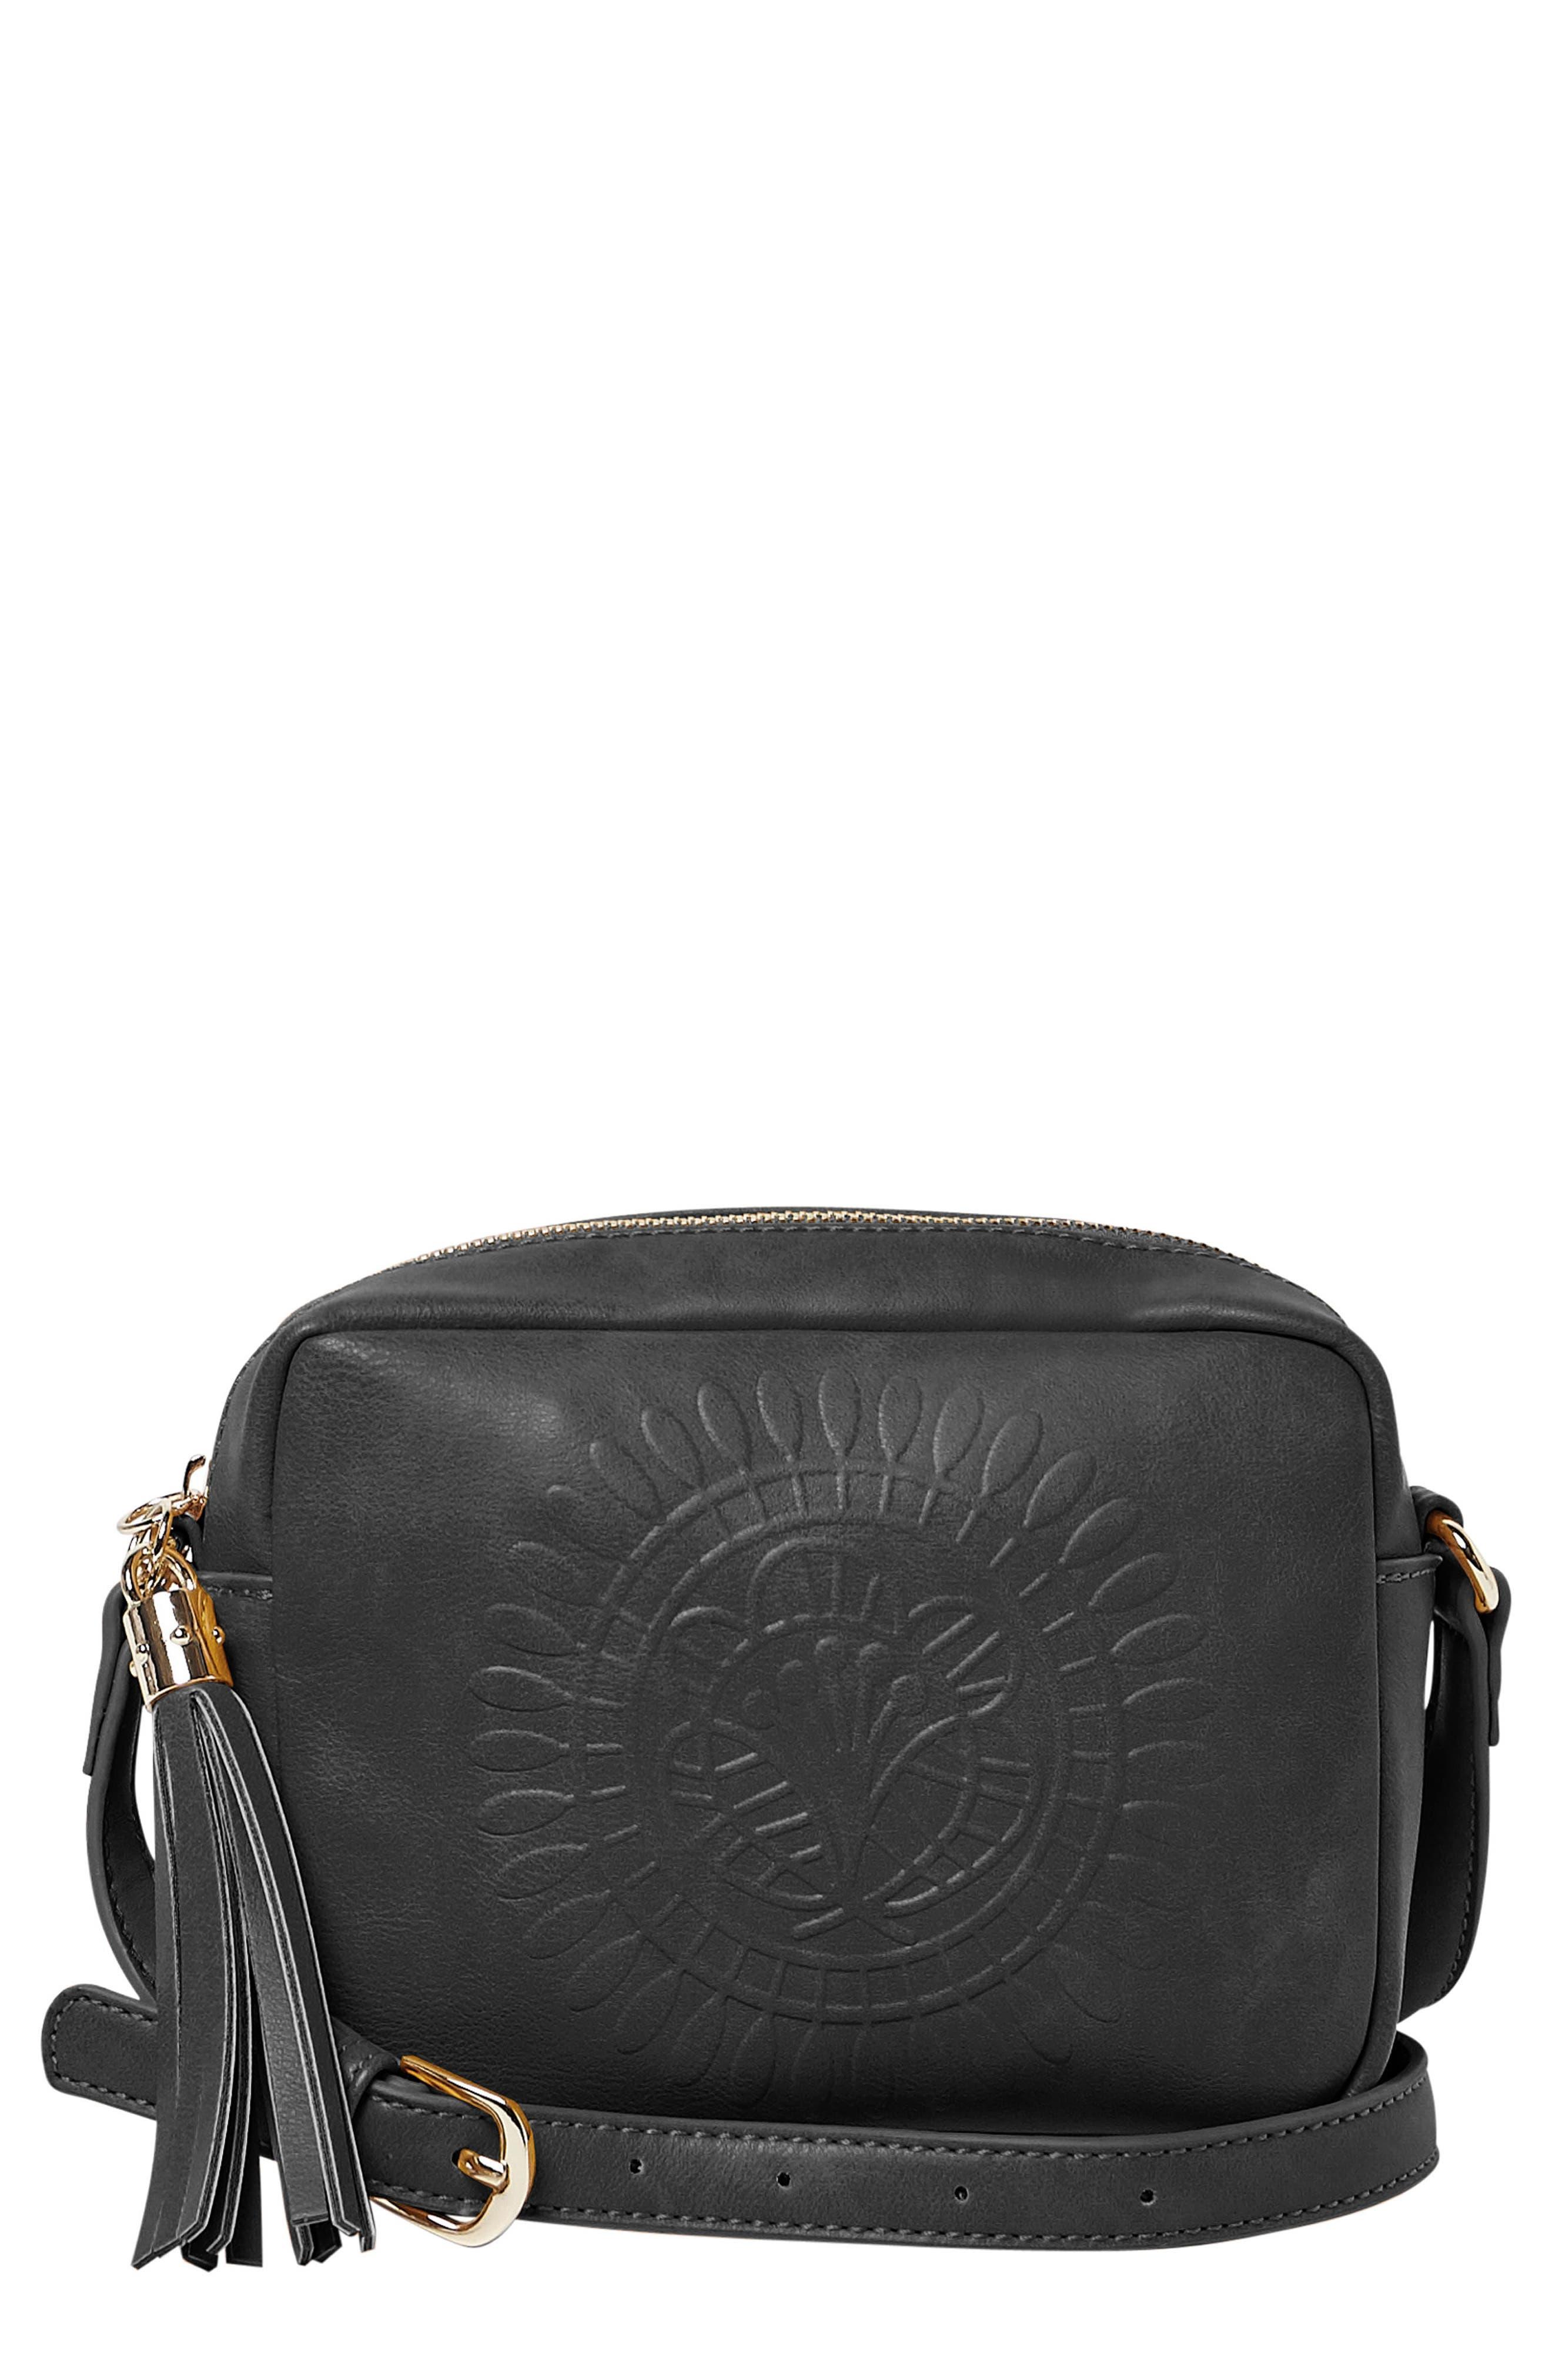 Wild Rose Embossed Vegan Leather Shoulder Bag,                             Main thumbnail 1, color,                             Black